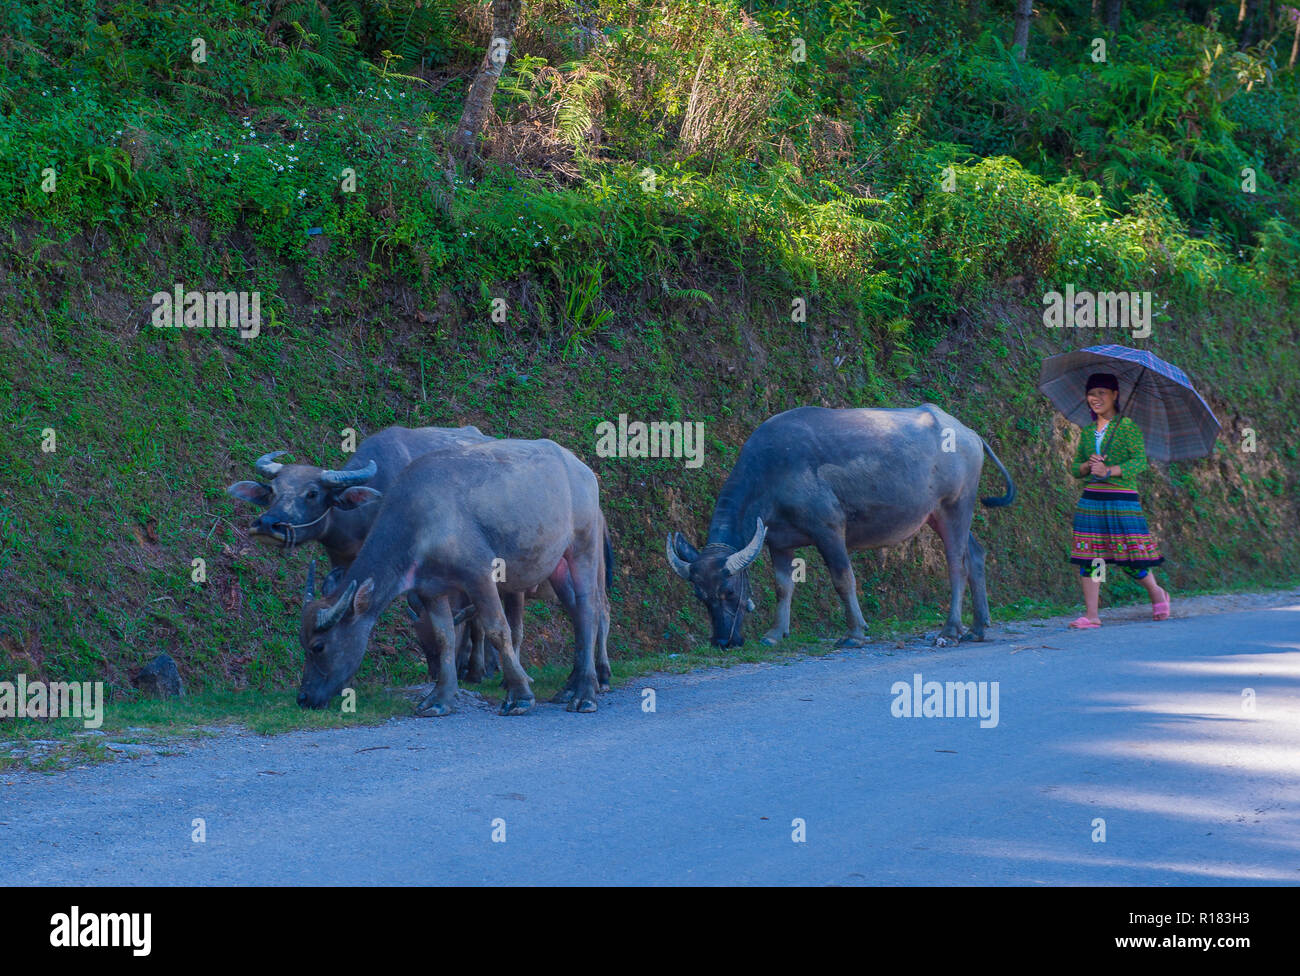 HA GIANG , VIETNAM - SEP 15 : Vietnamese farmer in the countrside near Ha Giang Vietnam on September 15 2018. nearly 80 percent of the population of V - Stock Image